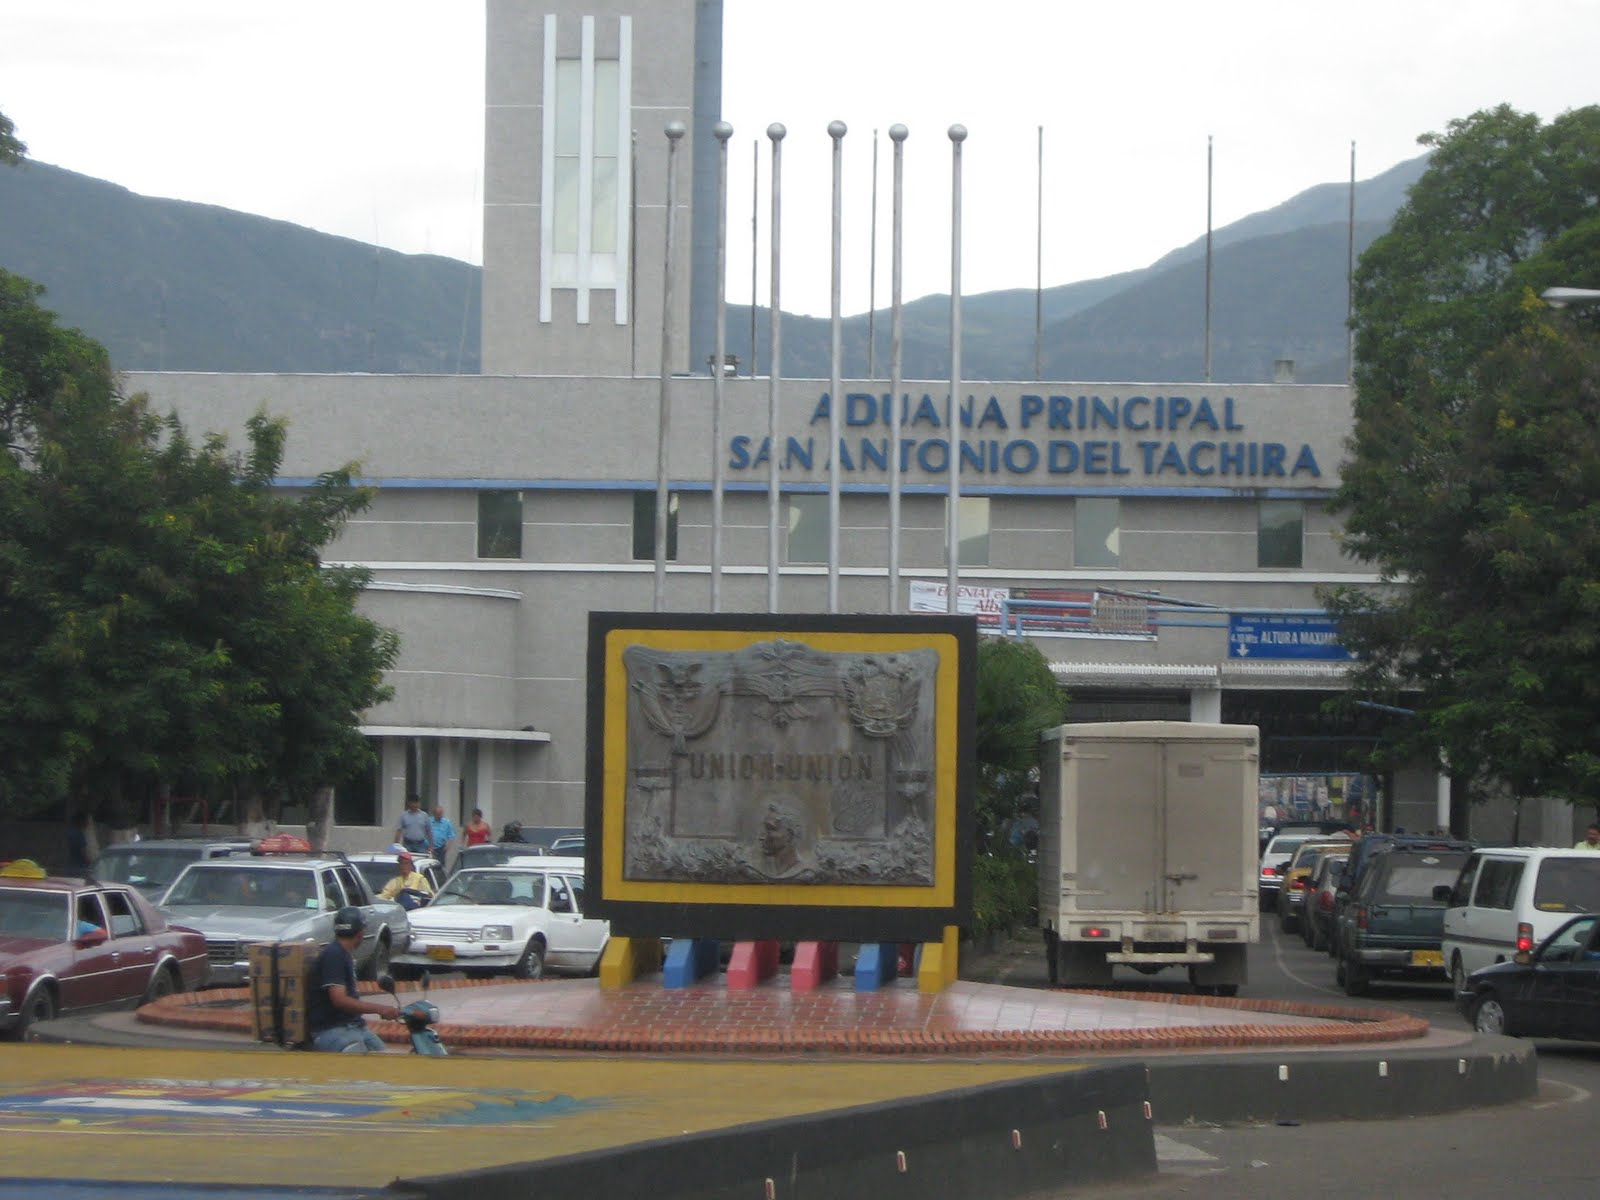 san antonio del tachira chatrooms [14086] wsximsmqrjmyup 投稿者:trishamathias 投稿日:2009/08/20(thu) 13:06  comment2,   myx.